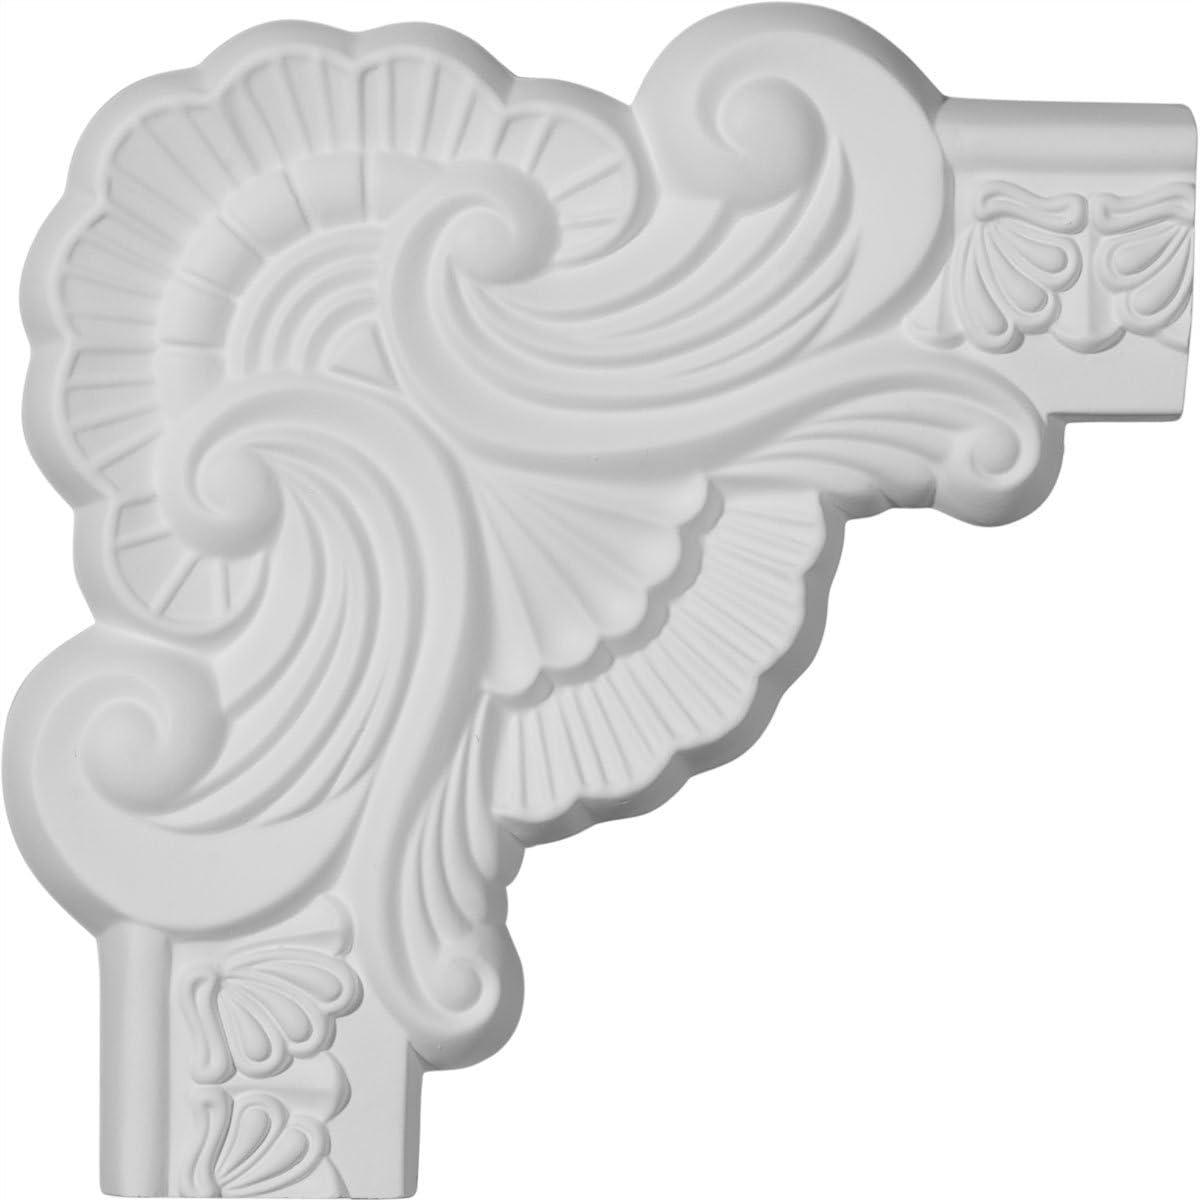 4-Pack 4 Piece Ekena Millwork Acanthus Leaf PML09X09AC-CASE-4 Panel Moulding Corner 9 3//8W x 9 3//8H Factory Primed